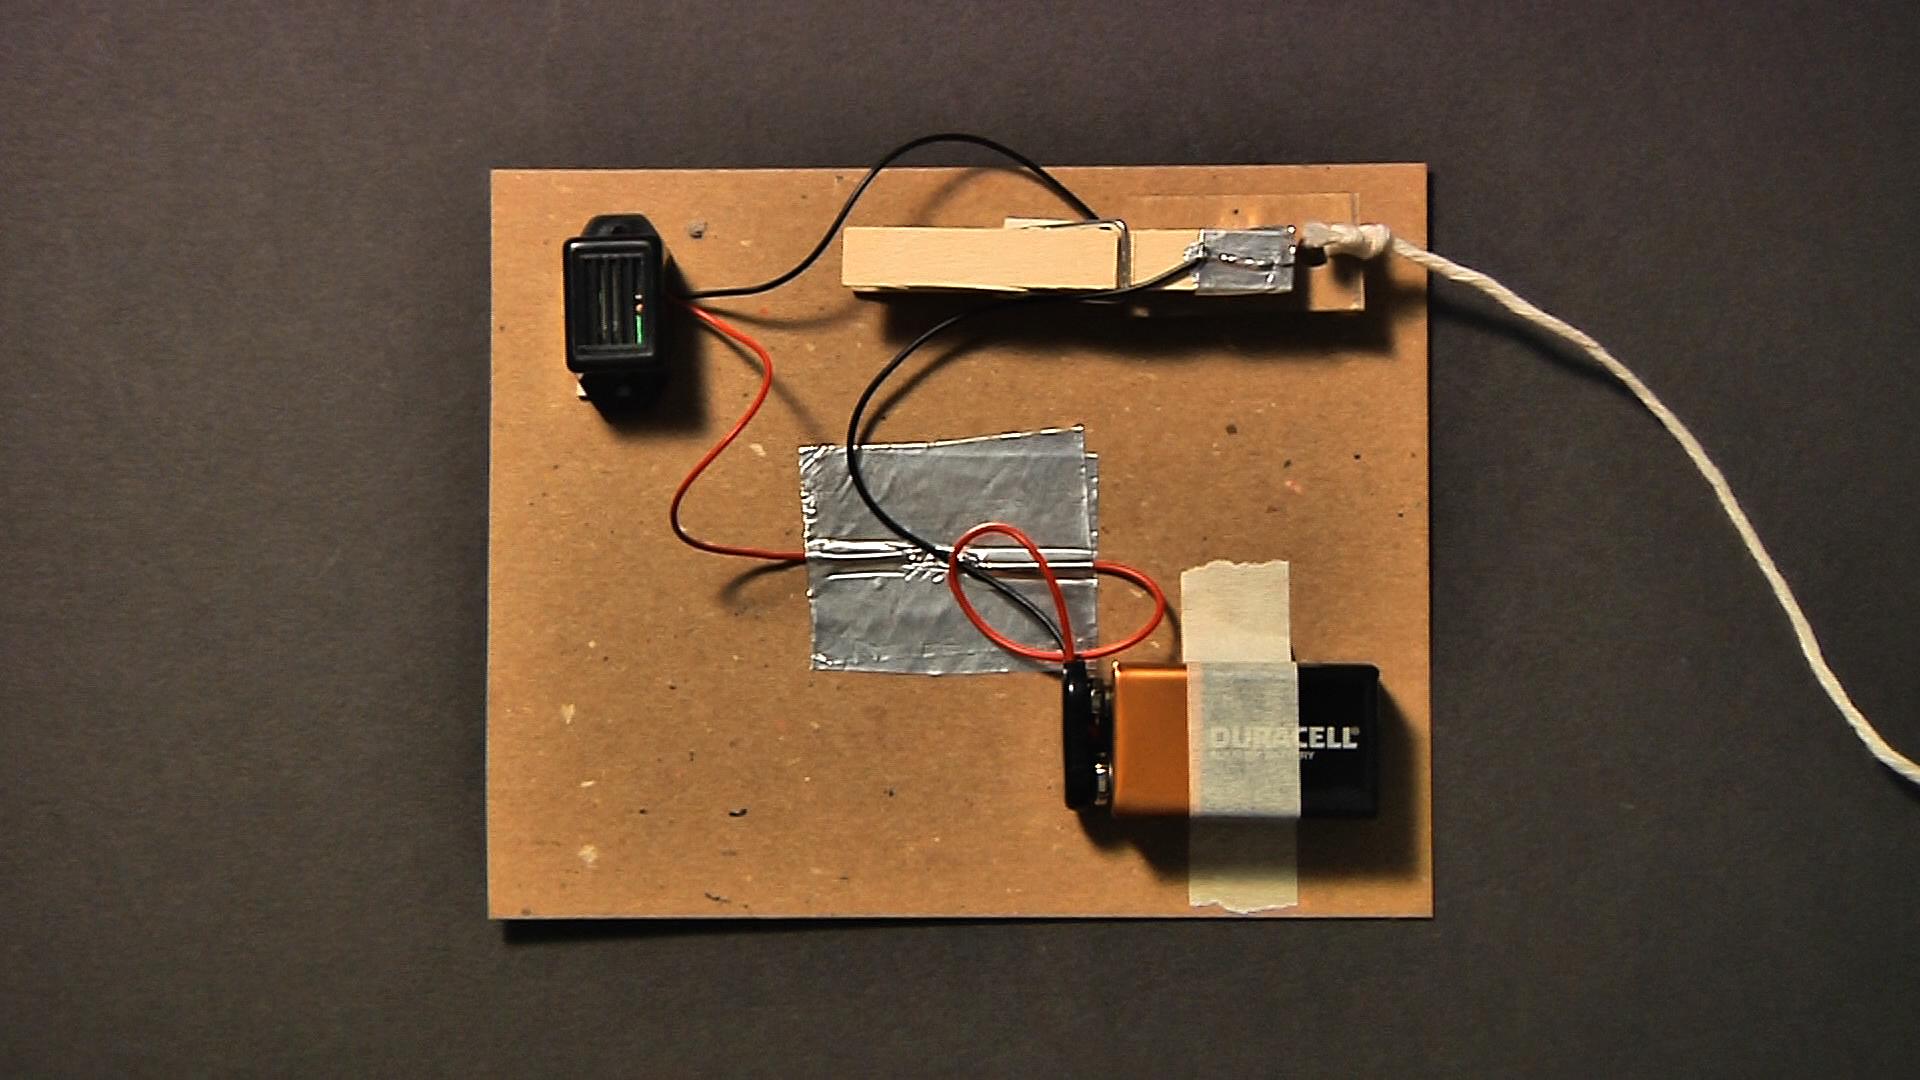 Science Museum Intruder Alarm Build An Alarm You Can Fit To Your Bedroom Door